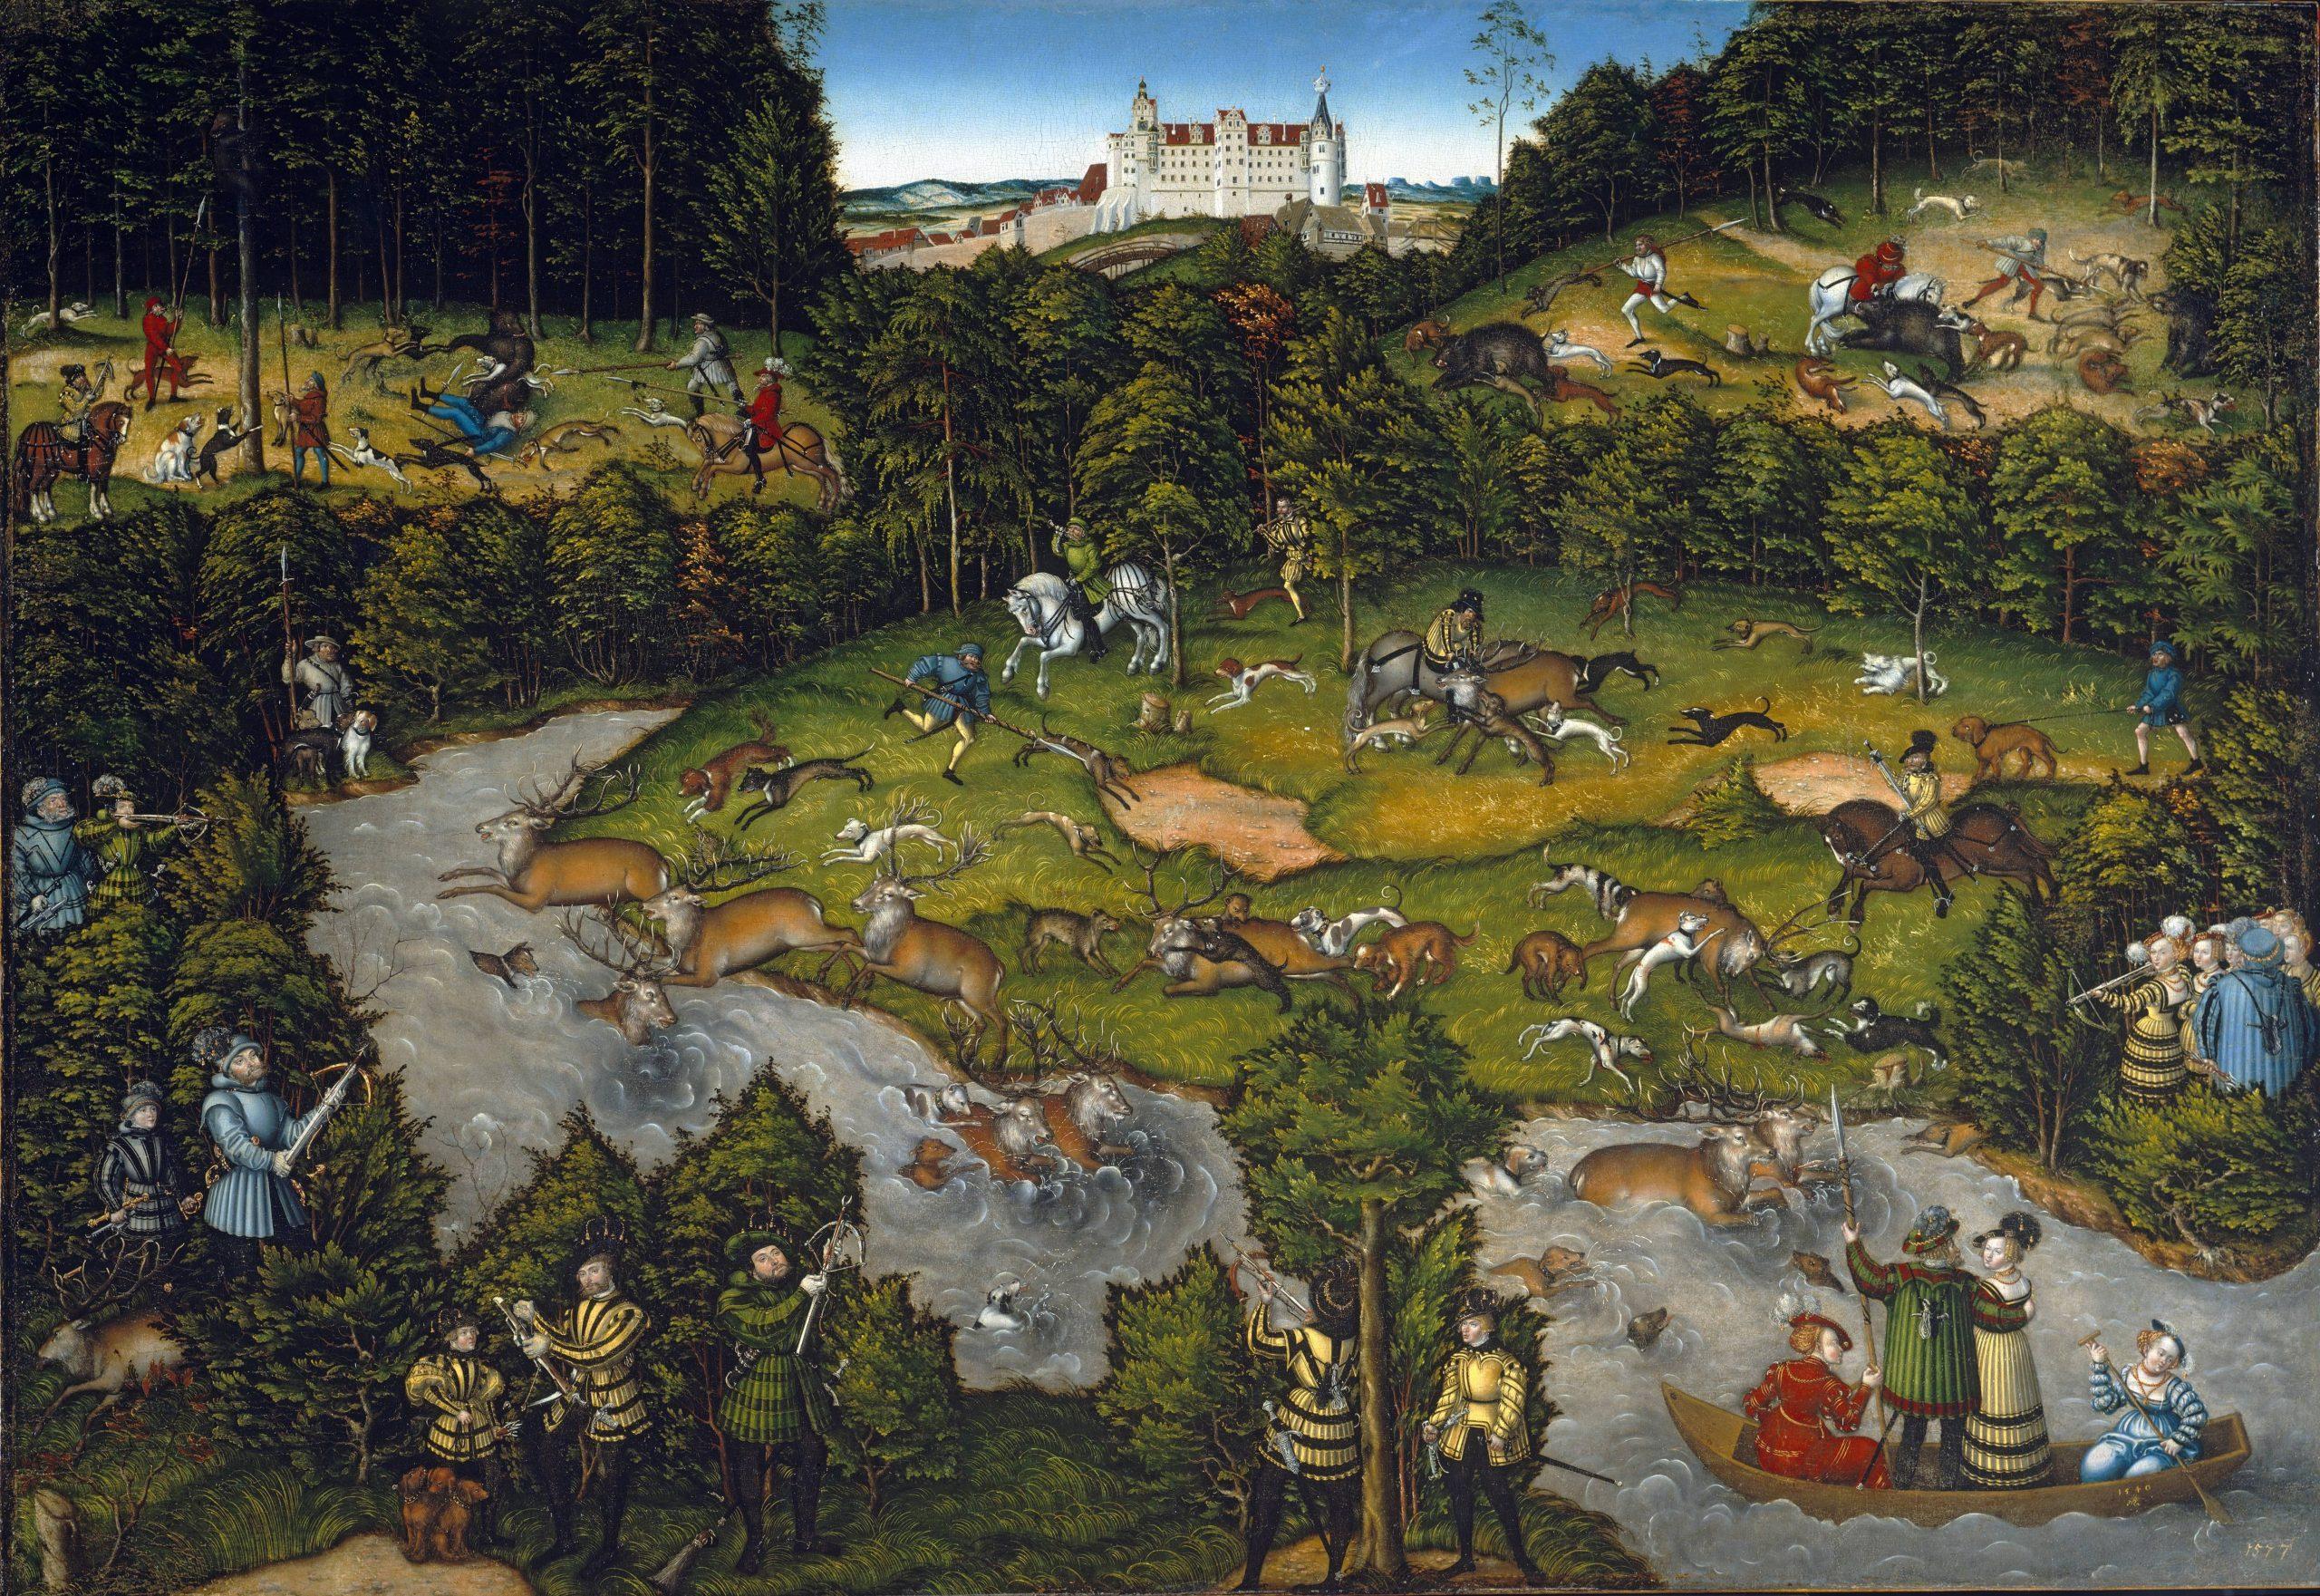 Lucas Cranach the Elder: Hunting Near Hartenfels Castle